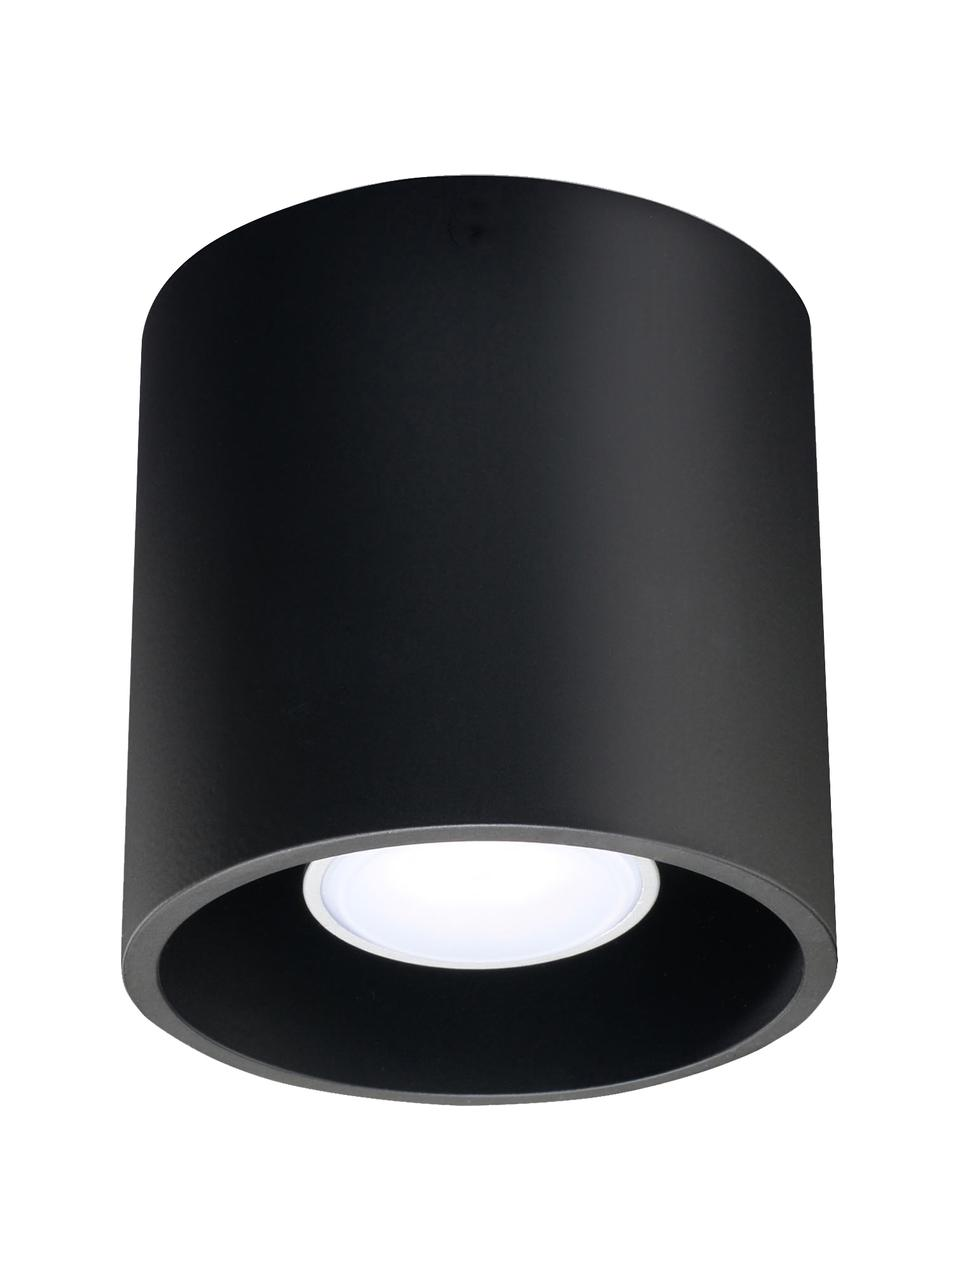 Lampa spot Roda, Czarny, Ø 10 x W 10 cm